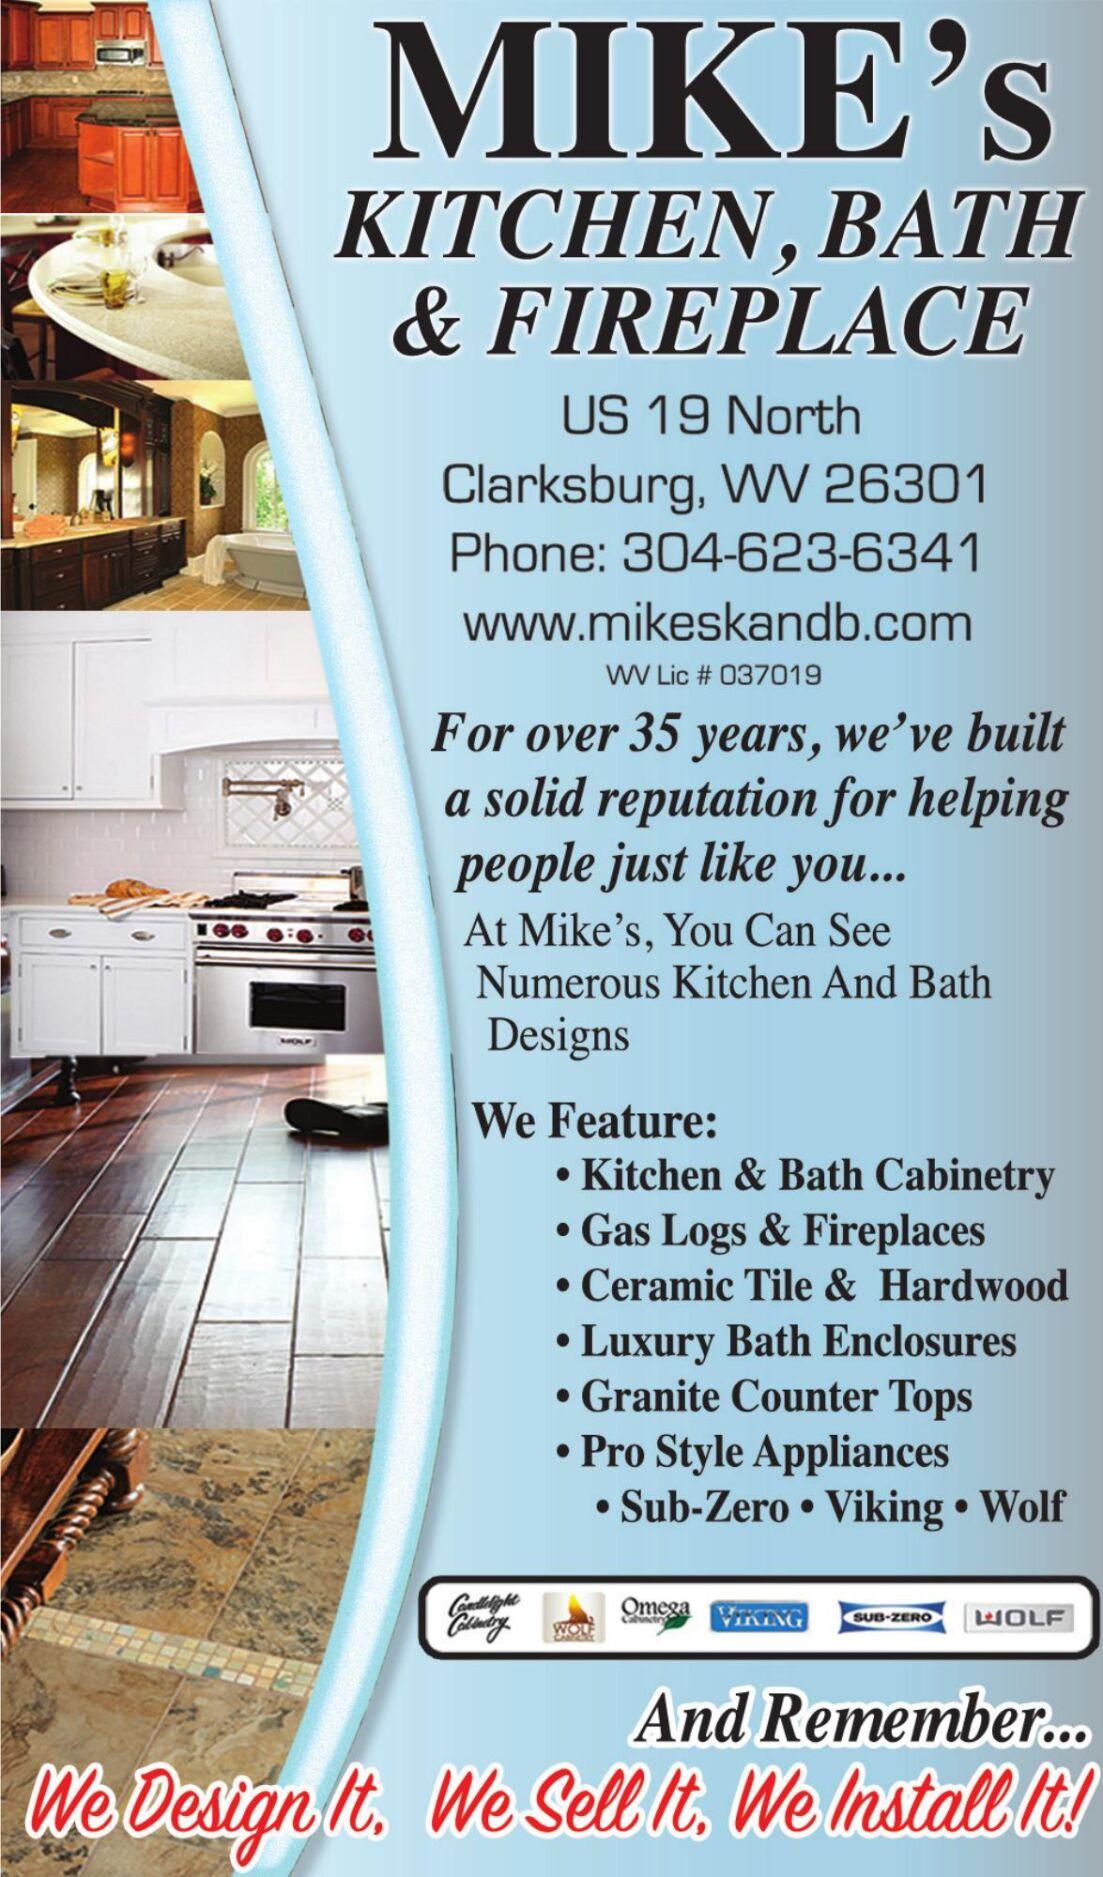 MIKE'S KITCHEN & BATH